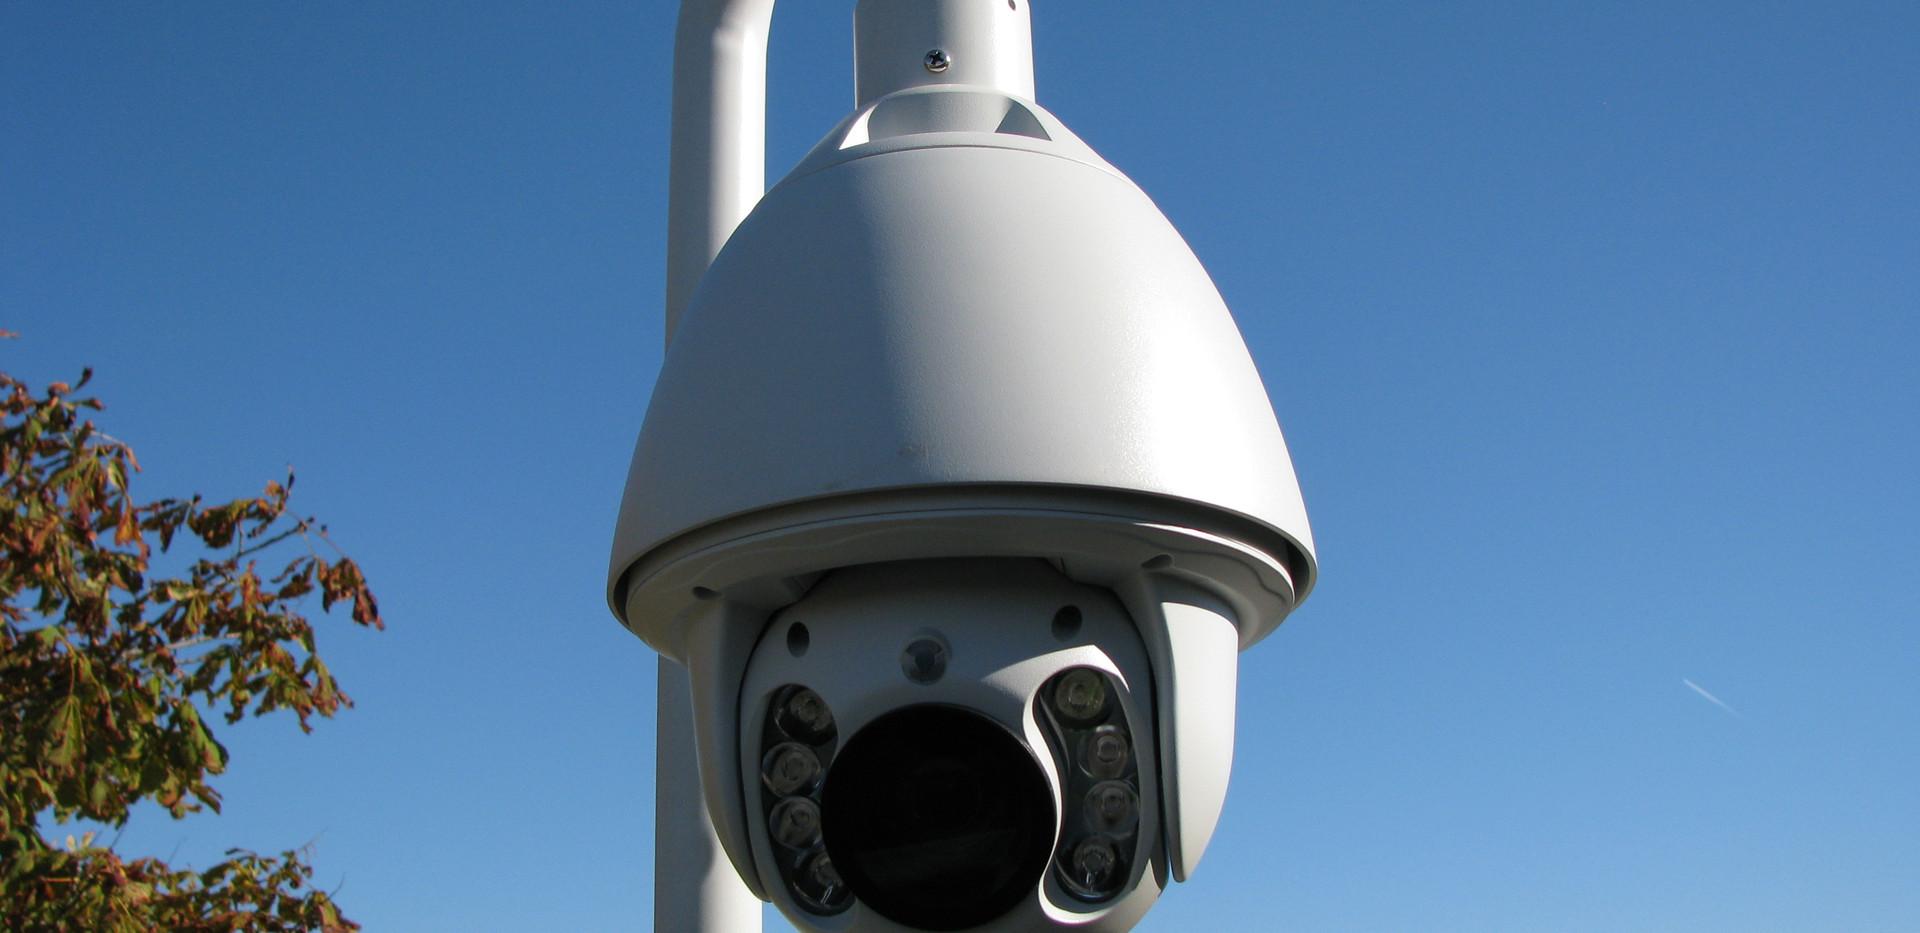 CCTV installers Wire Wizards in West Sus